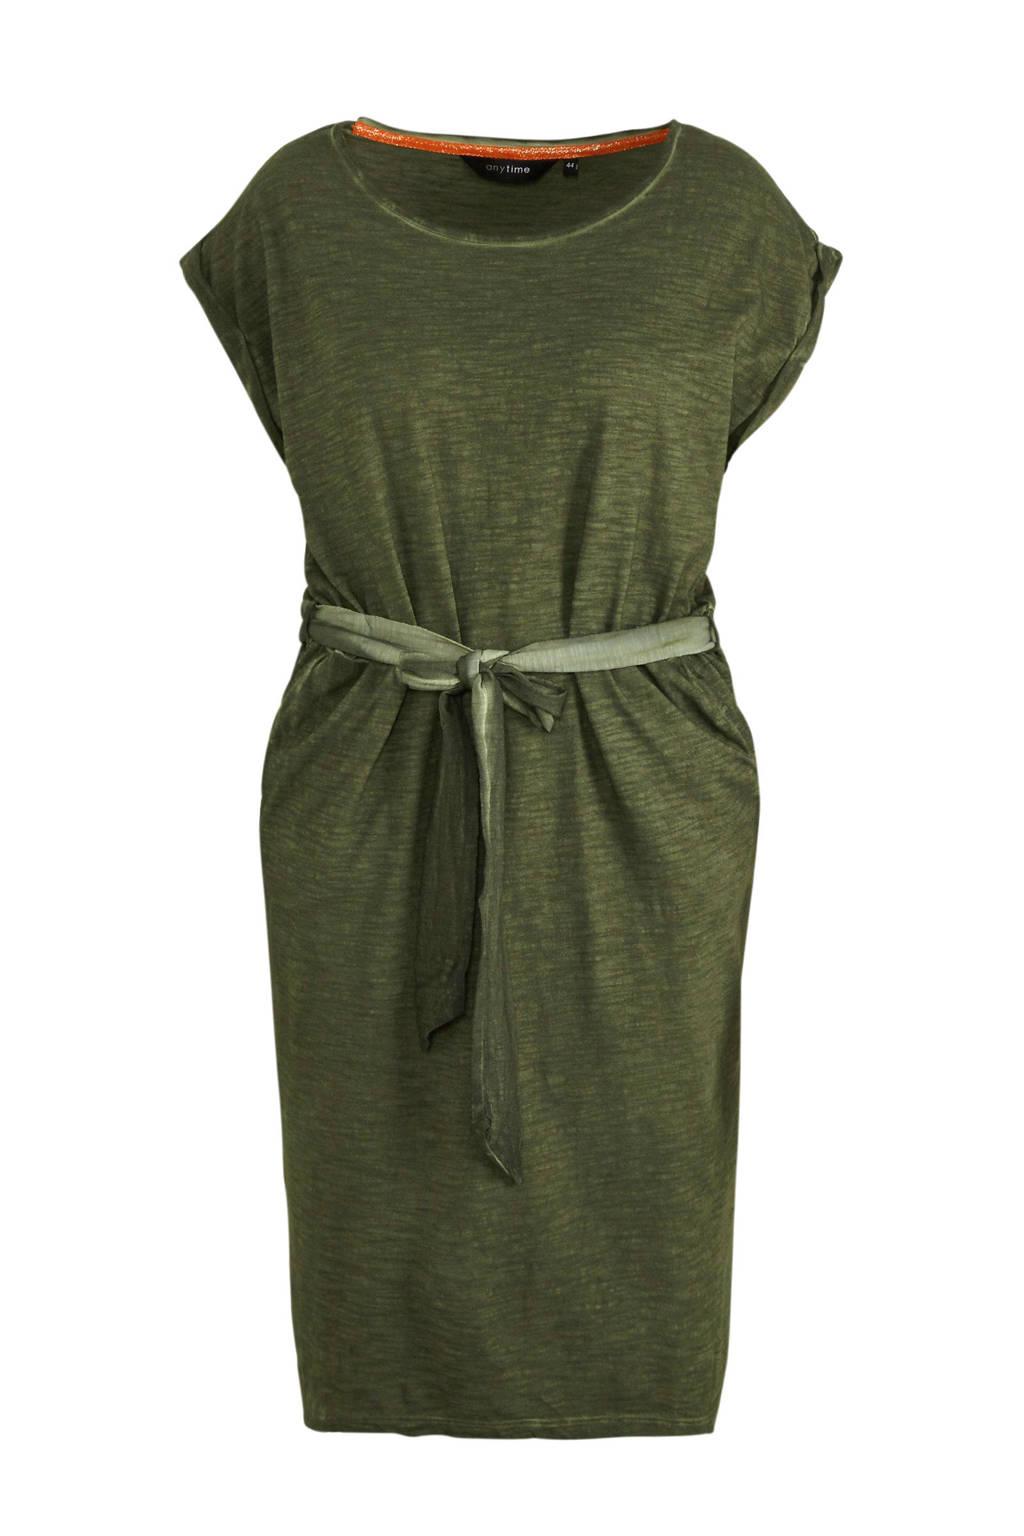 anytime pigment dye jurk Plus size groen, Donkergroen